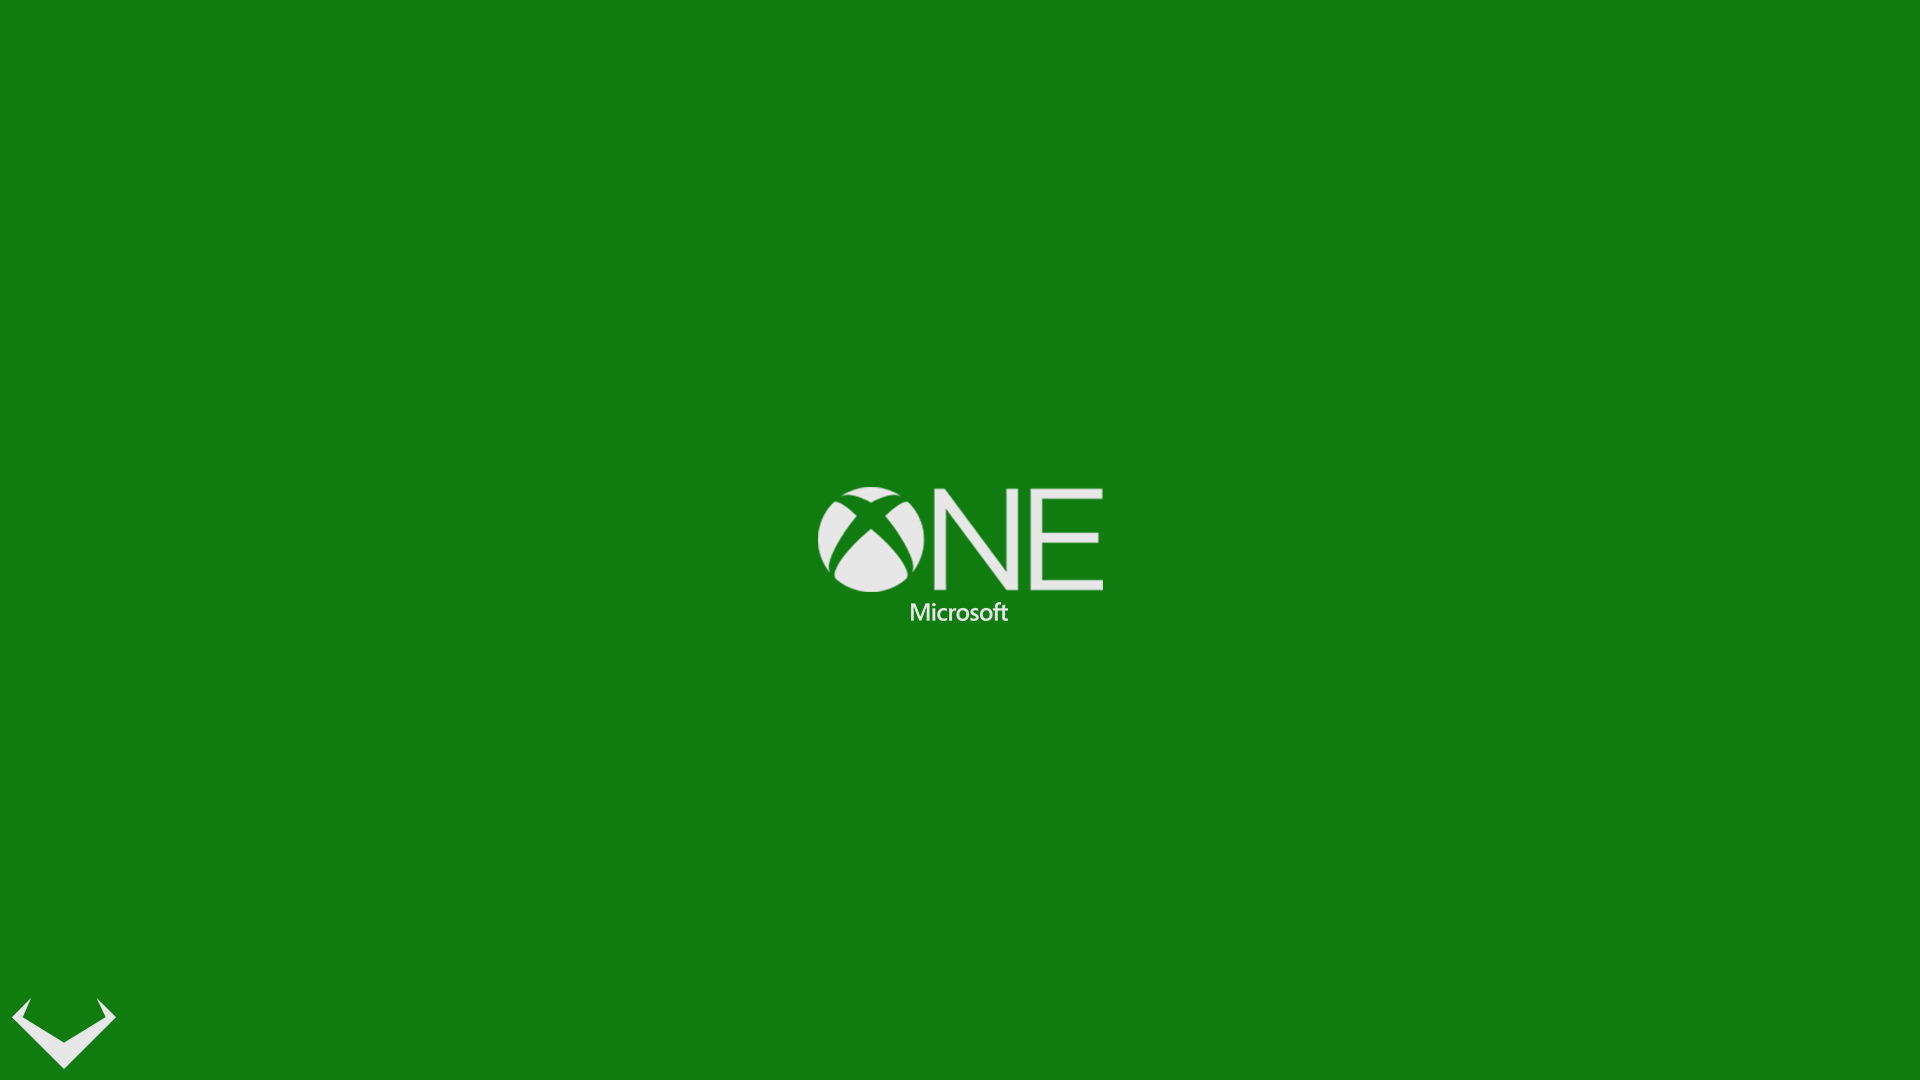 [48+] Best Xbox One Wallpapers on WallpaperSafari